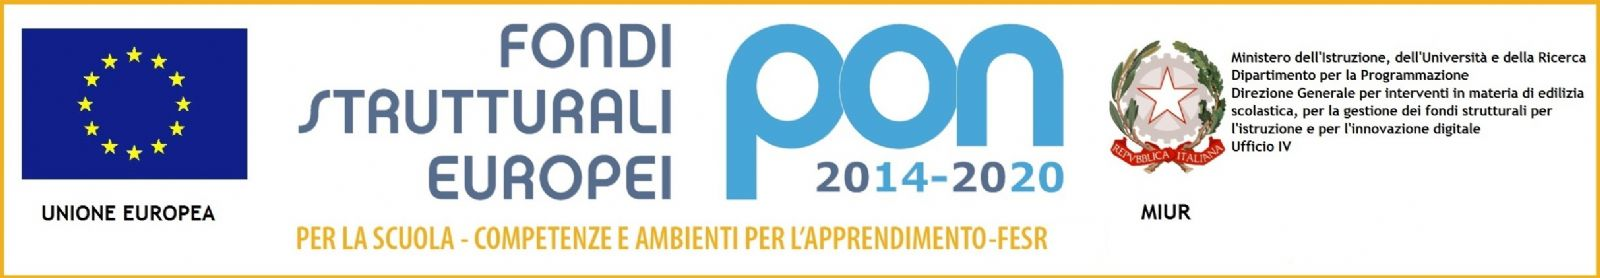 Logo Fondi Strutturali Europei Pon